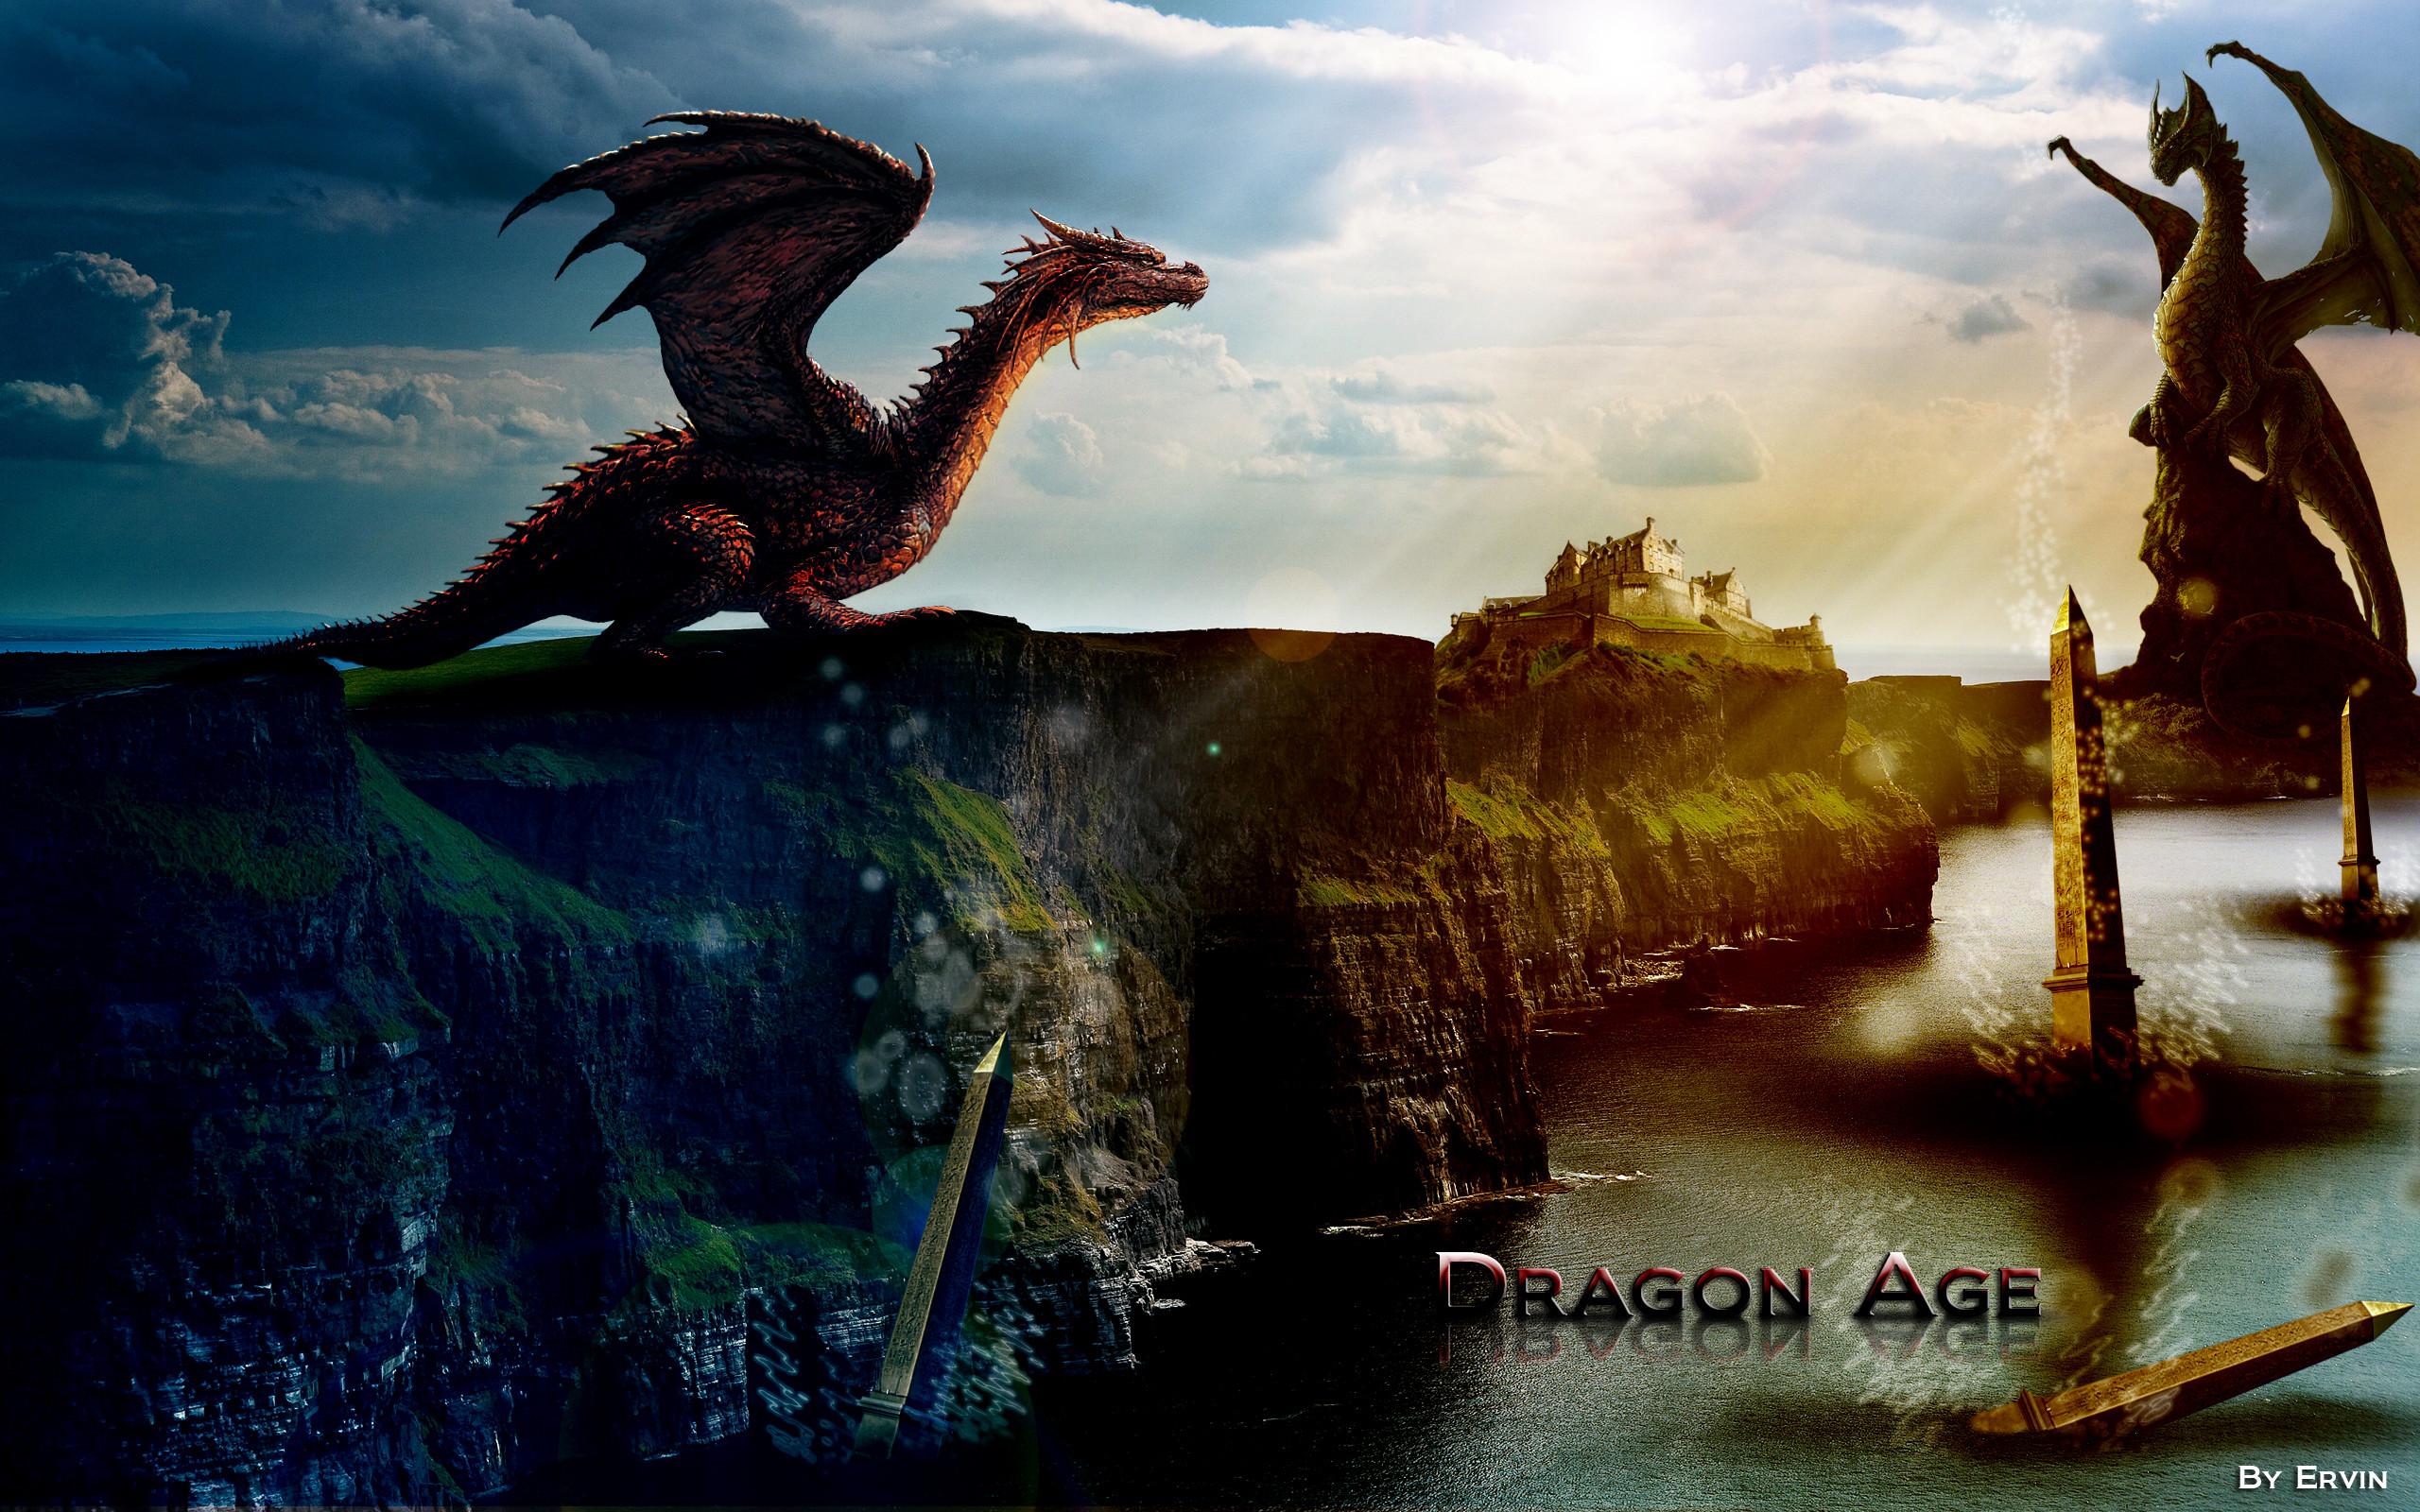 High Quality Live Dragon Age Wallpapers – 2788373, Annalisa Bruns